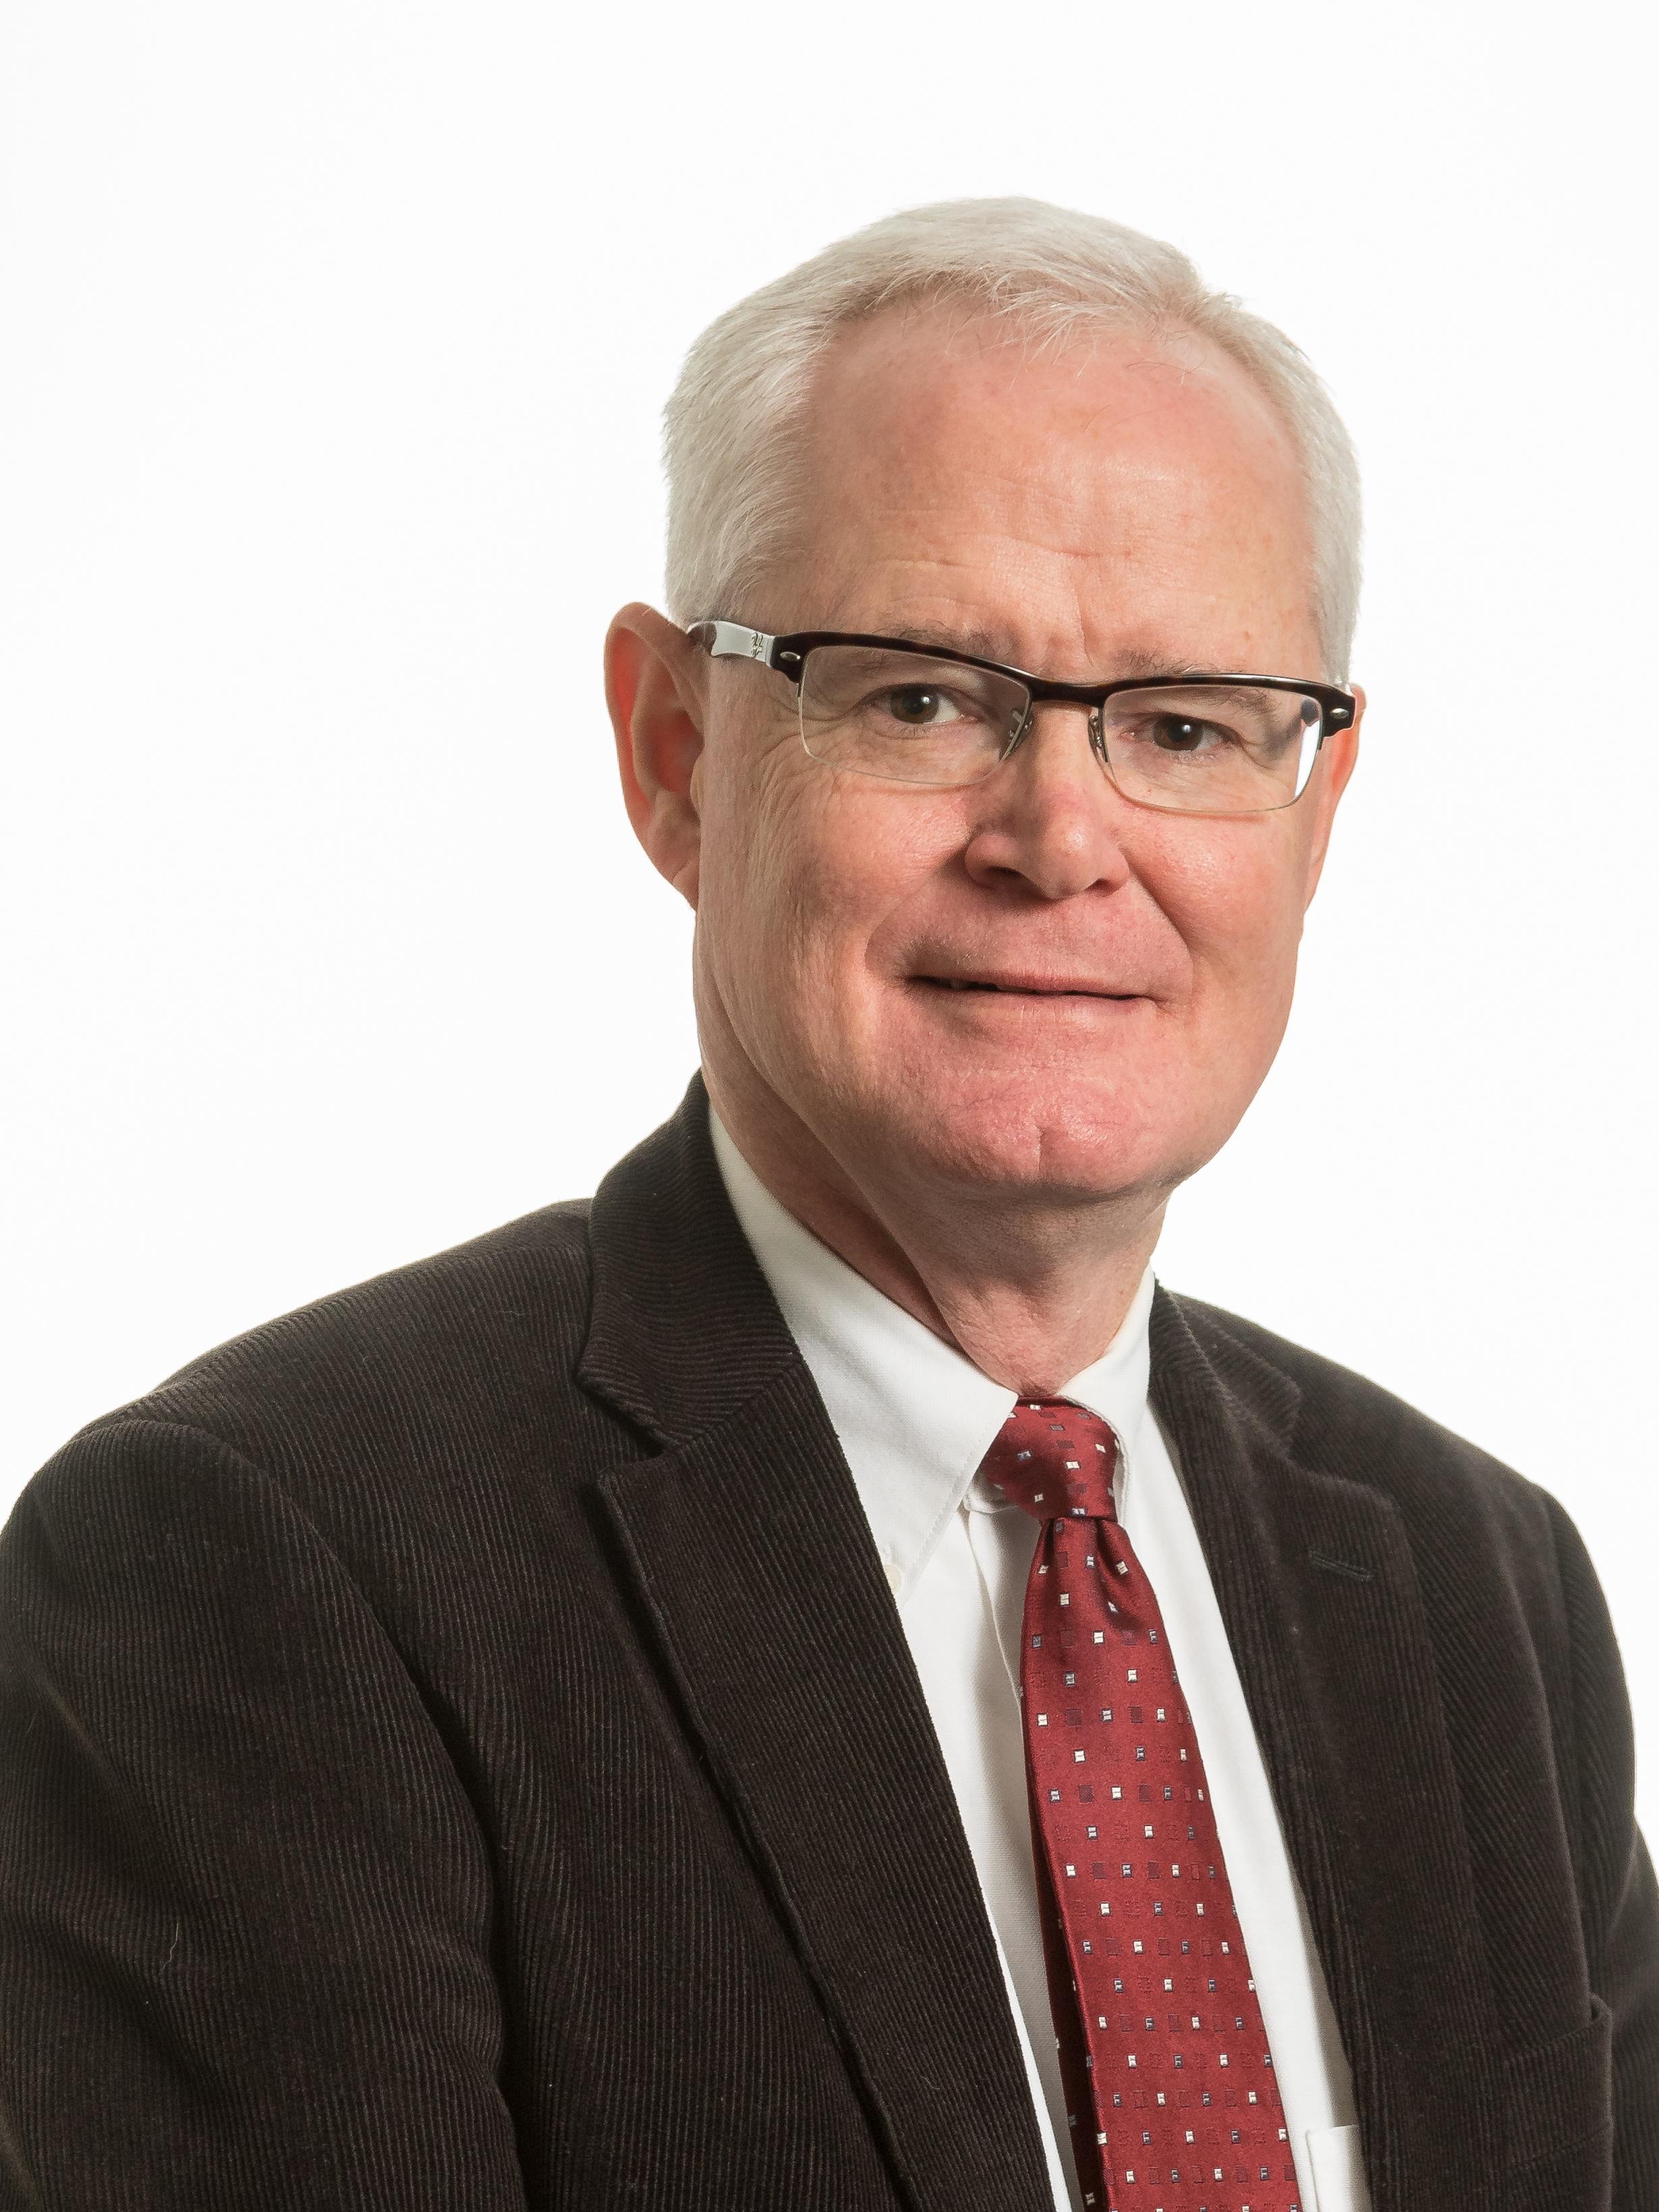 Employee Spotlight: Jeff Ballard, P.E.